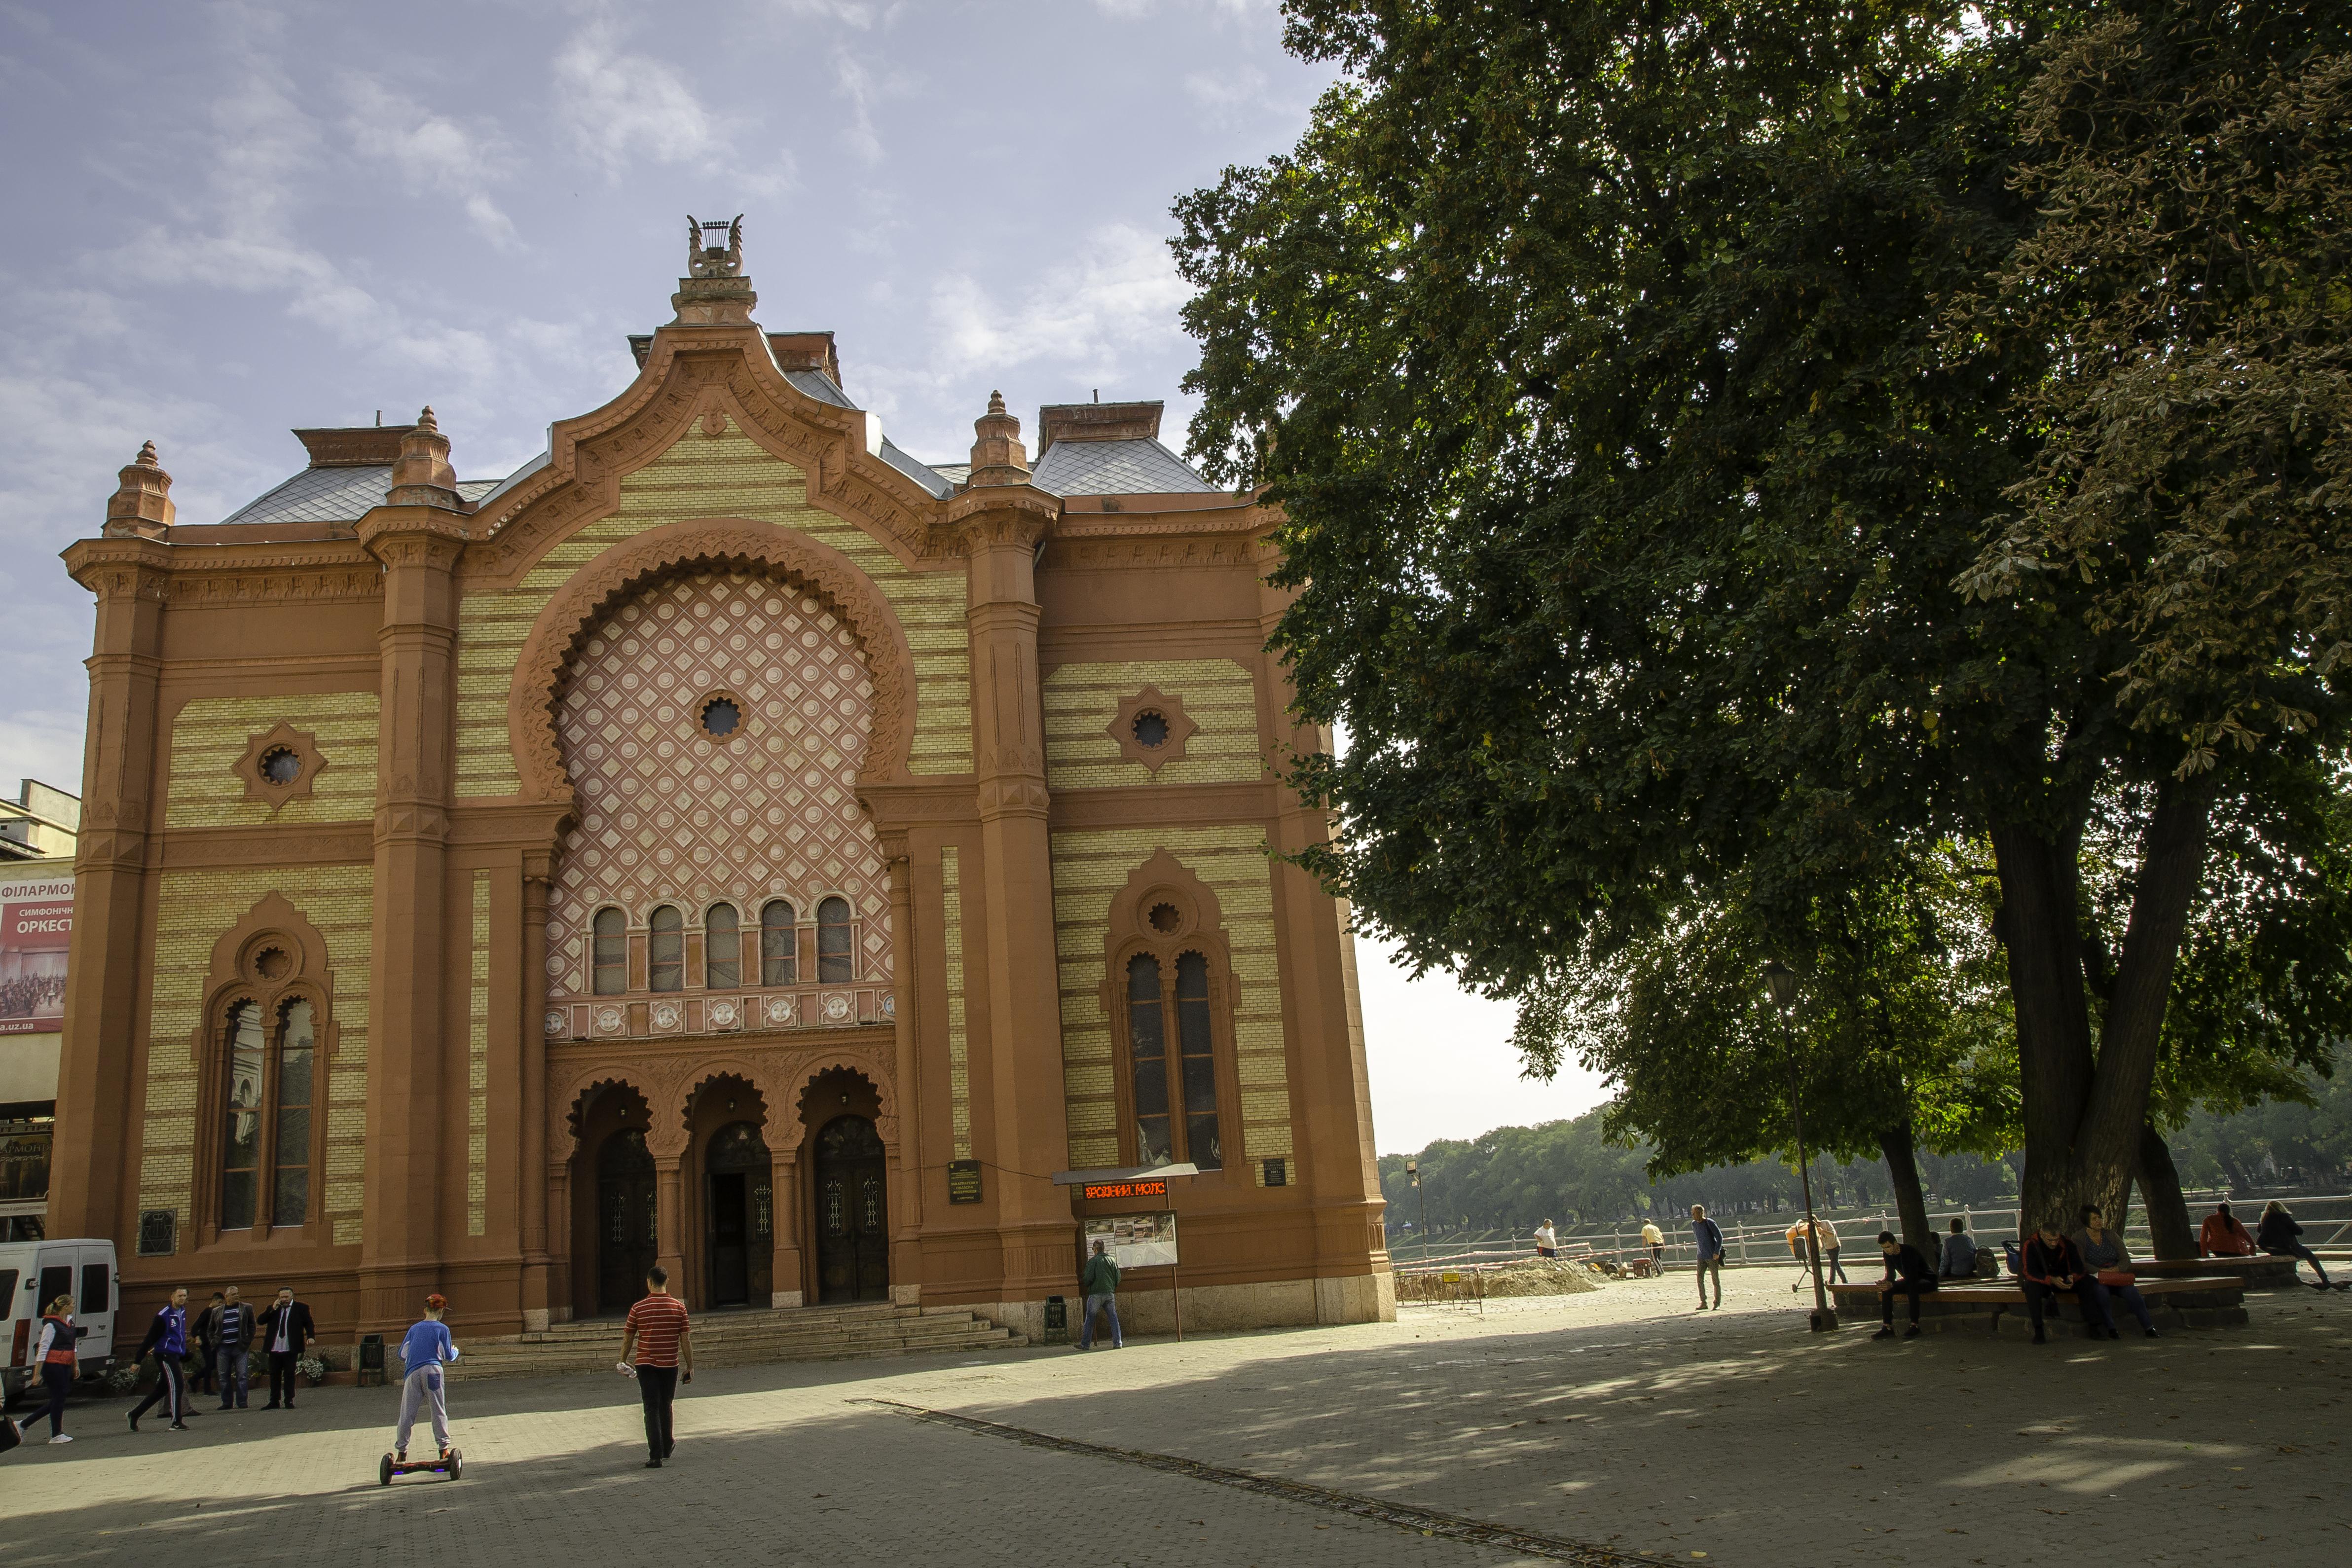 Elhurcoltak temploma